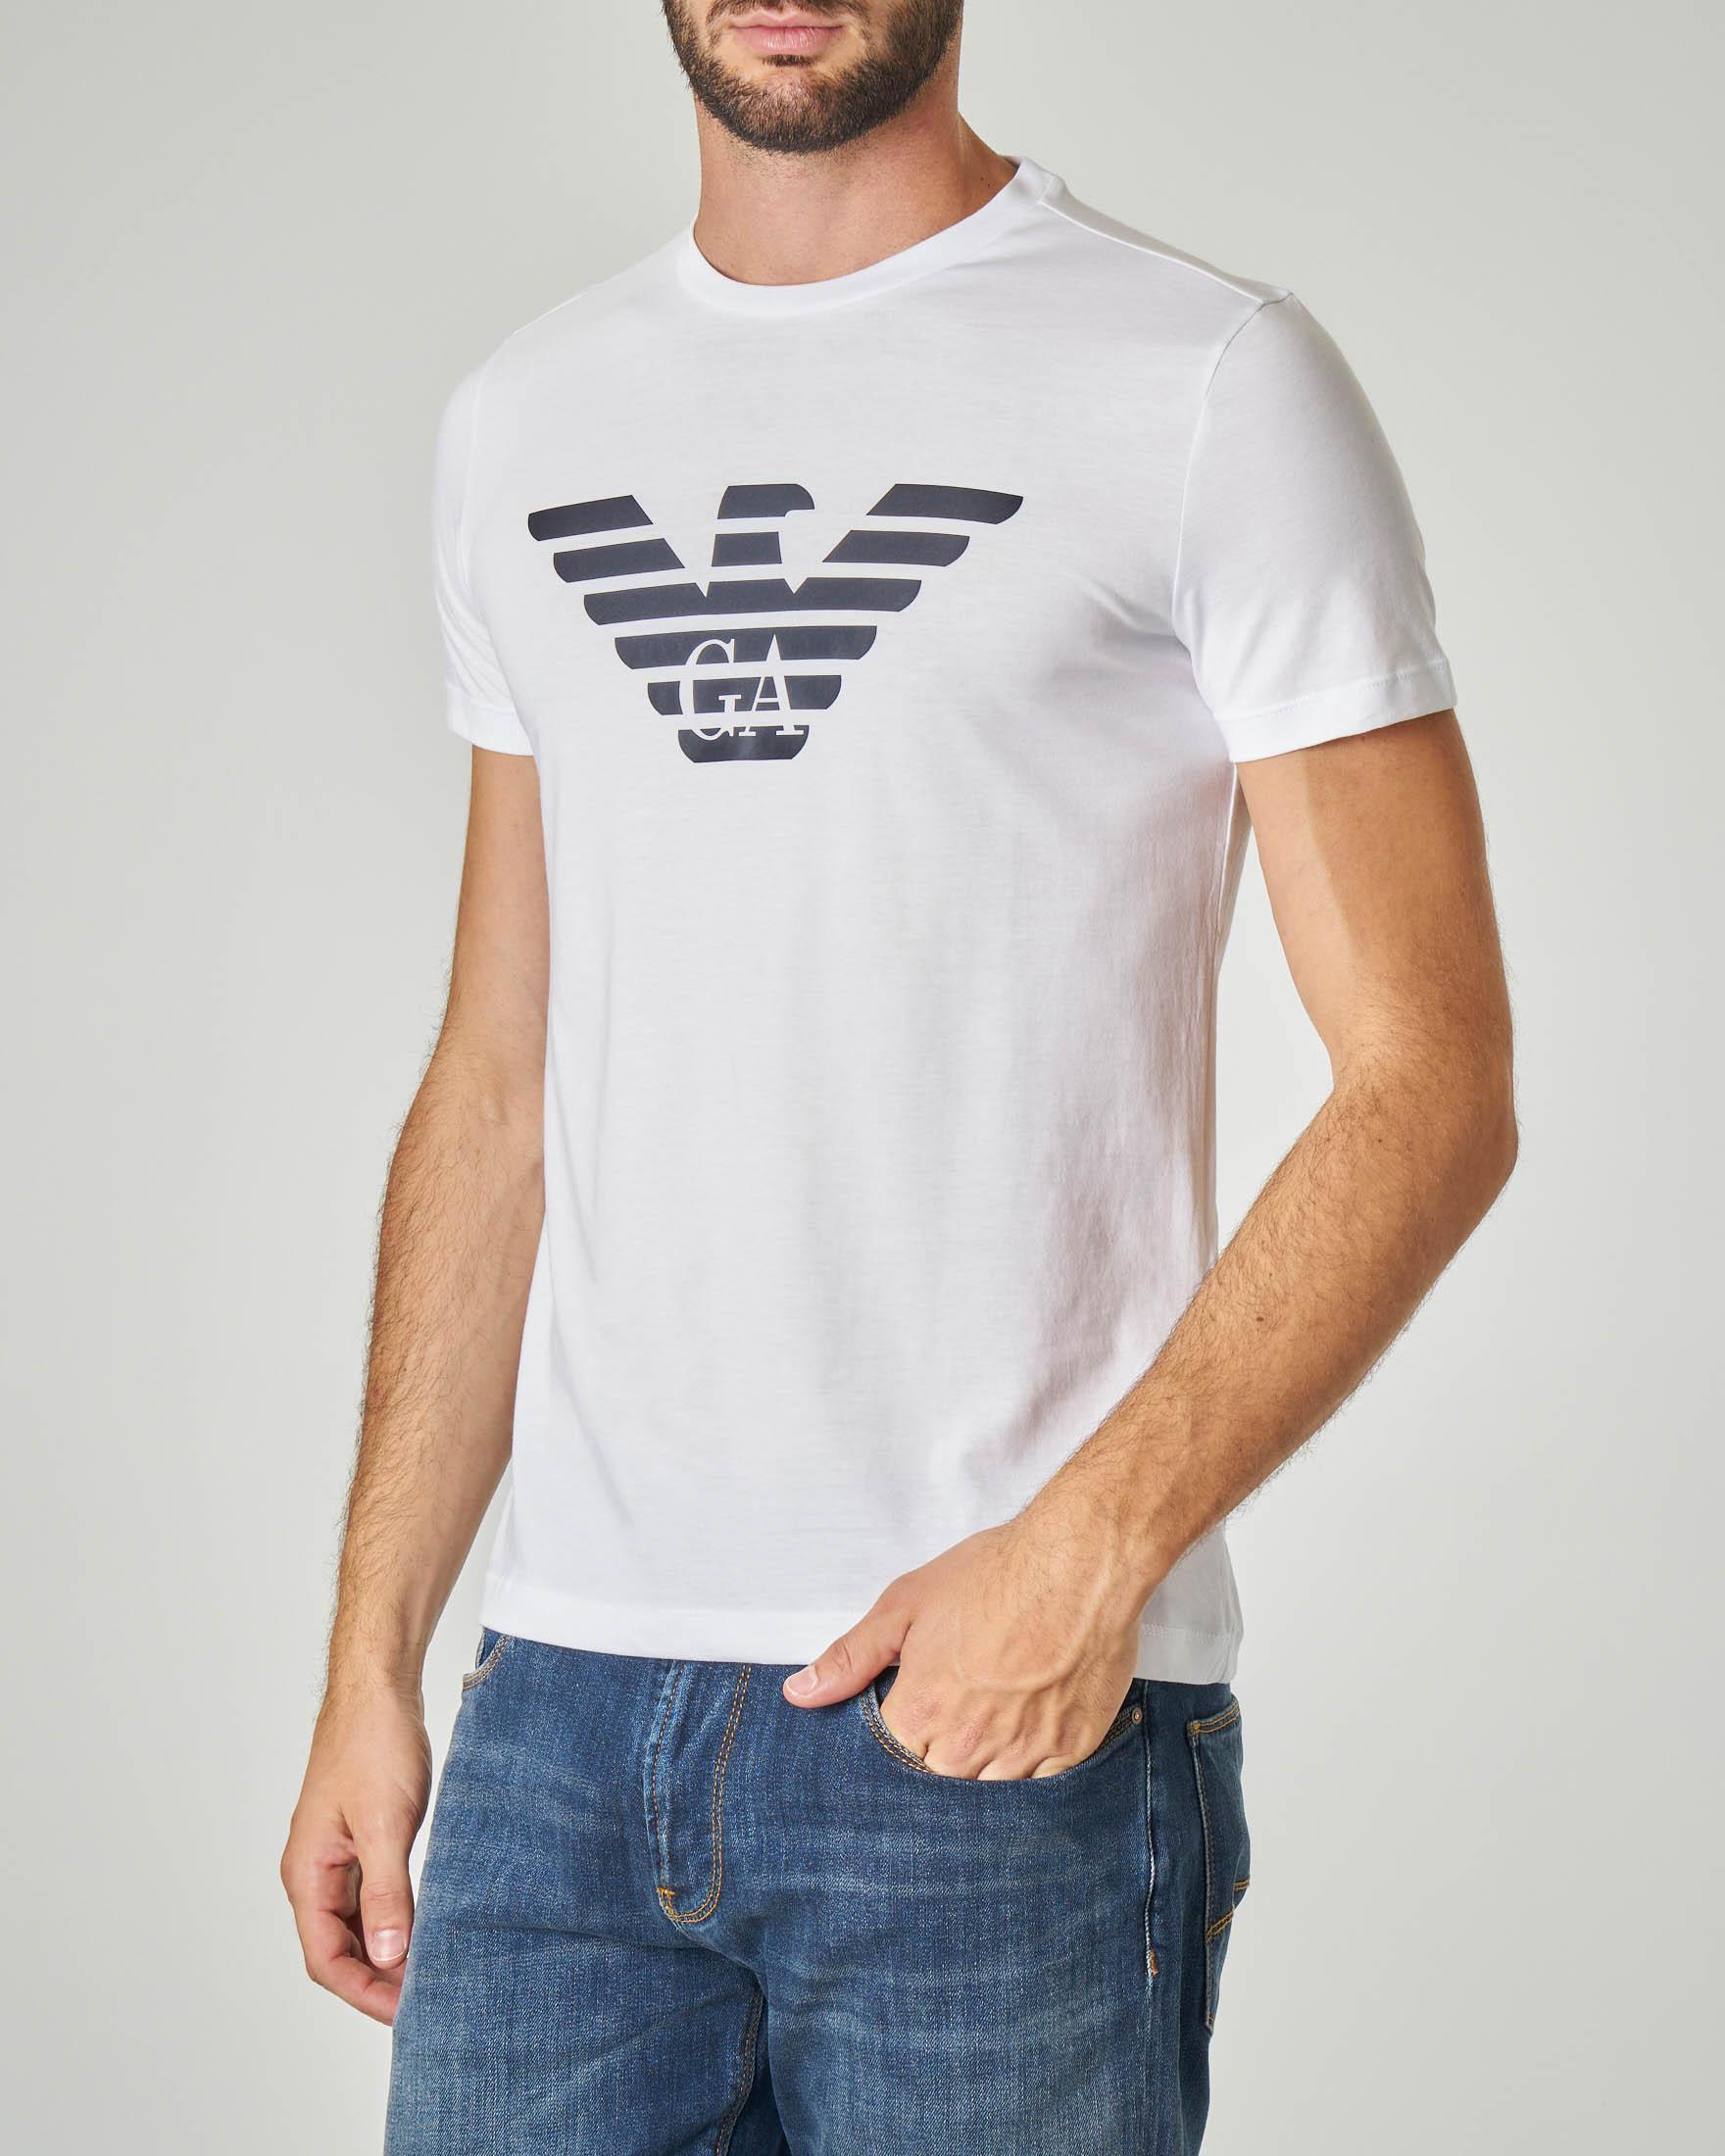 T-shirt bianca con logo aquila stampato